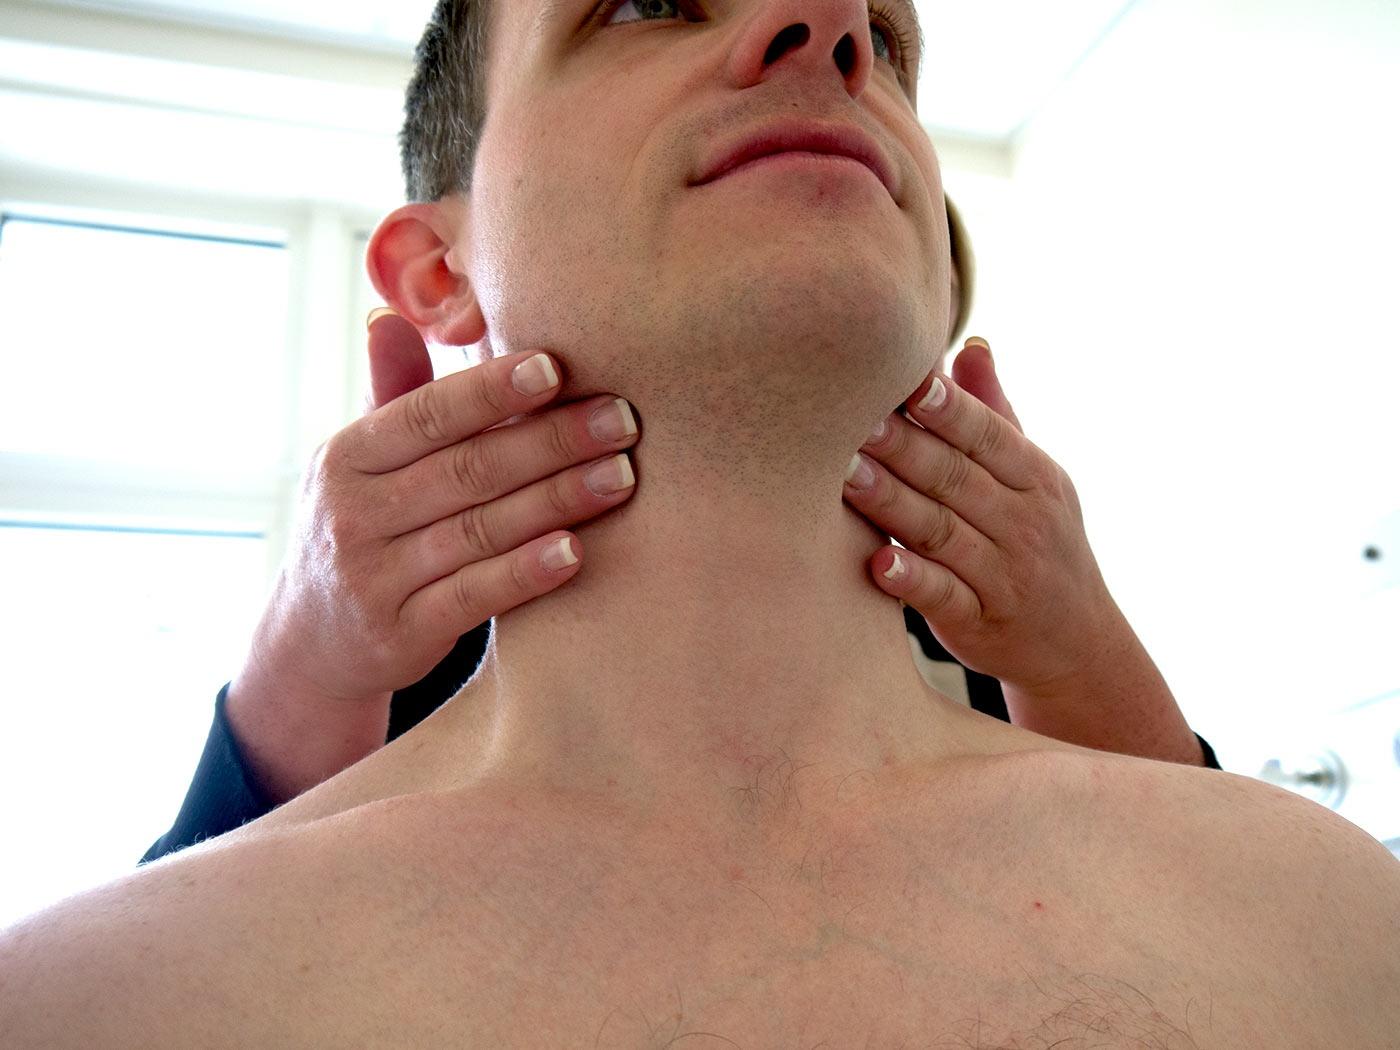 Palpate the submandibular lymph nodes